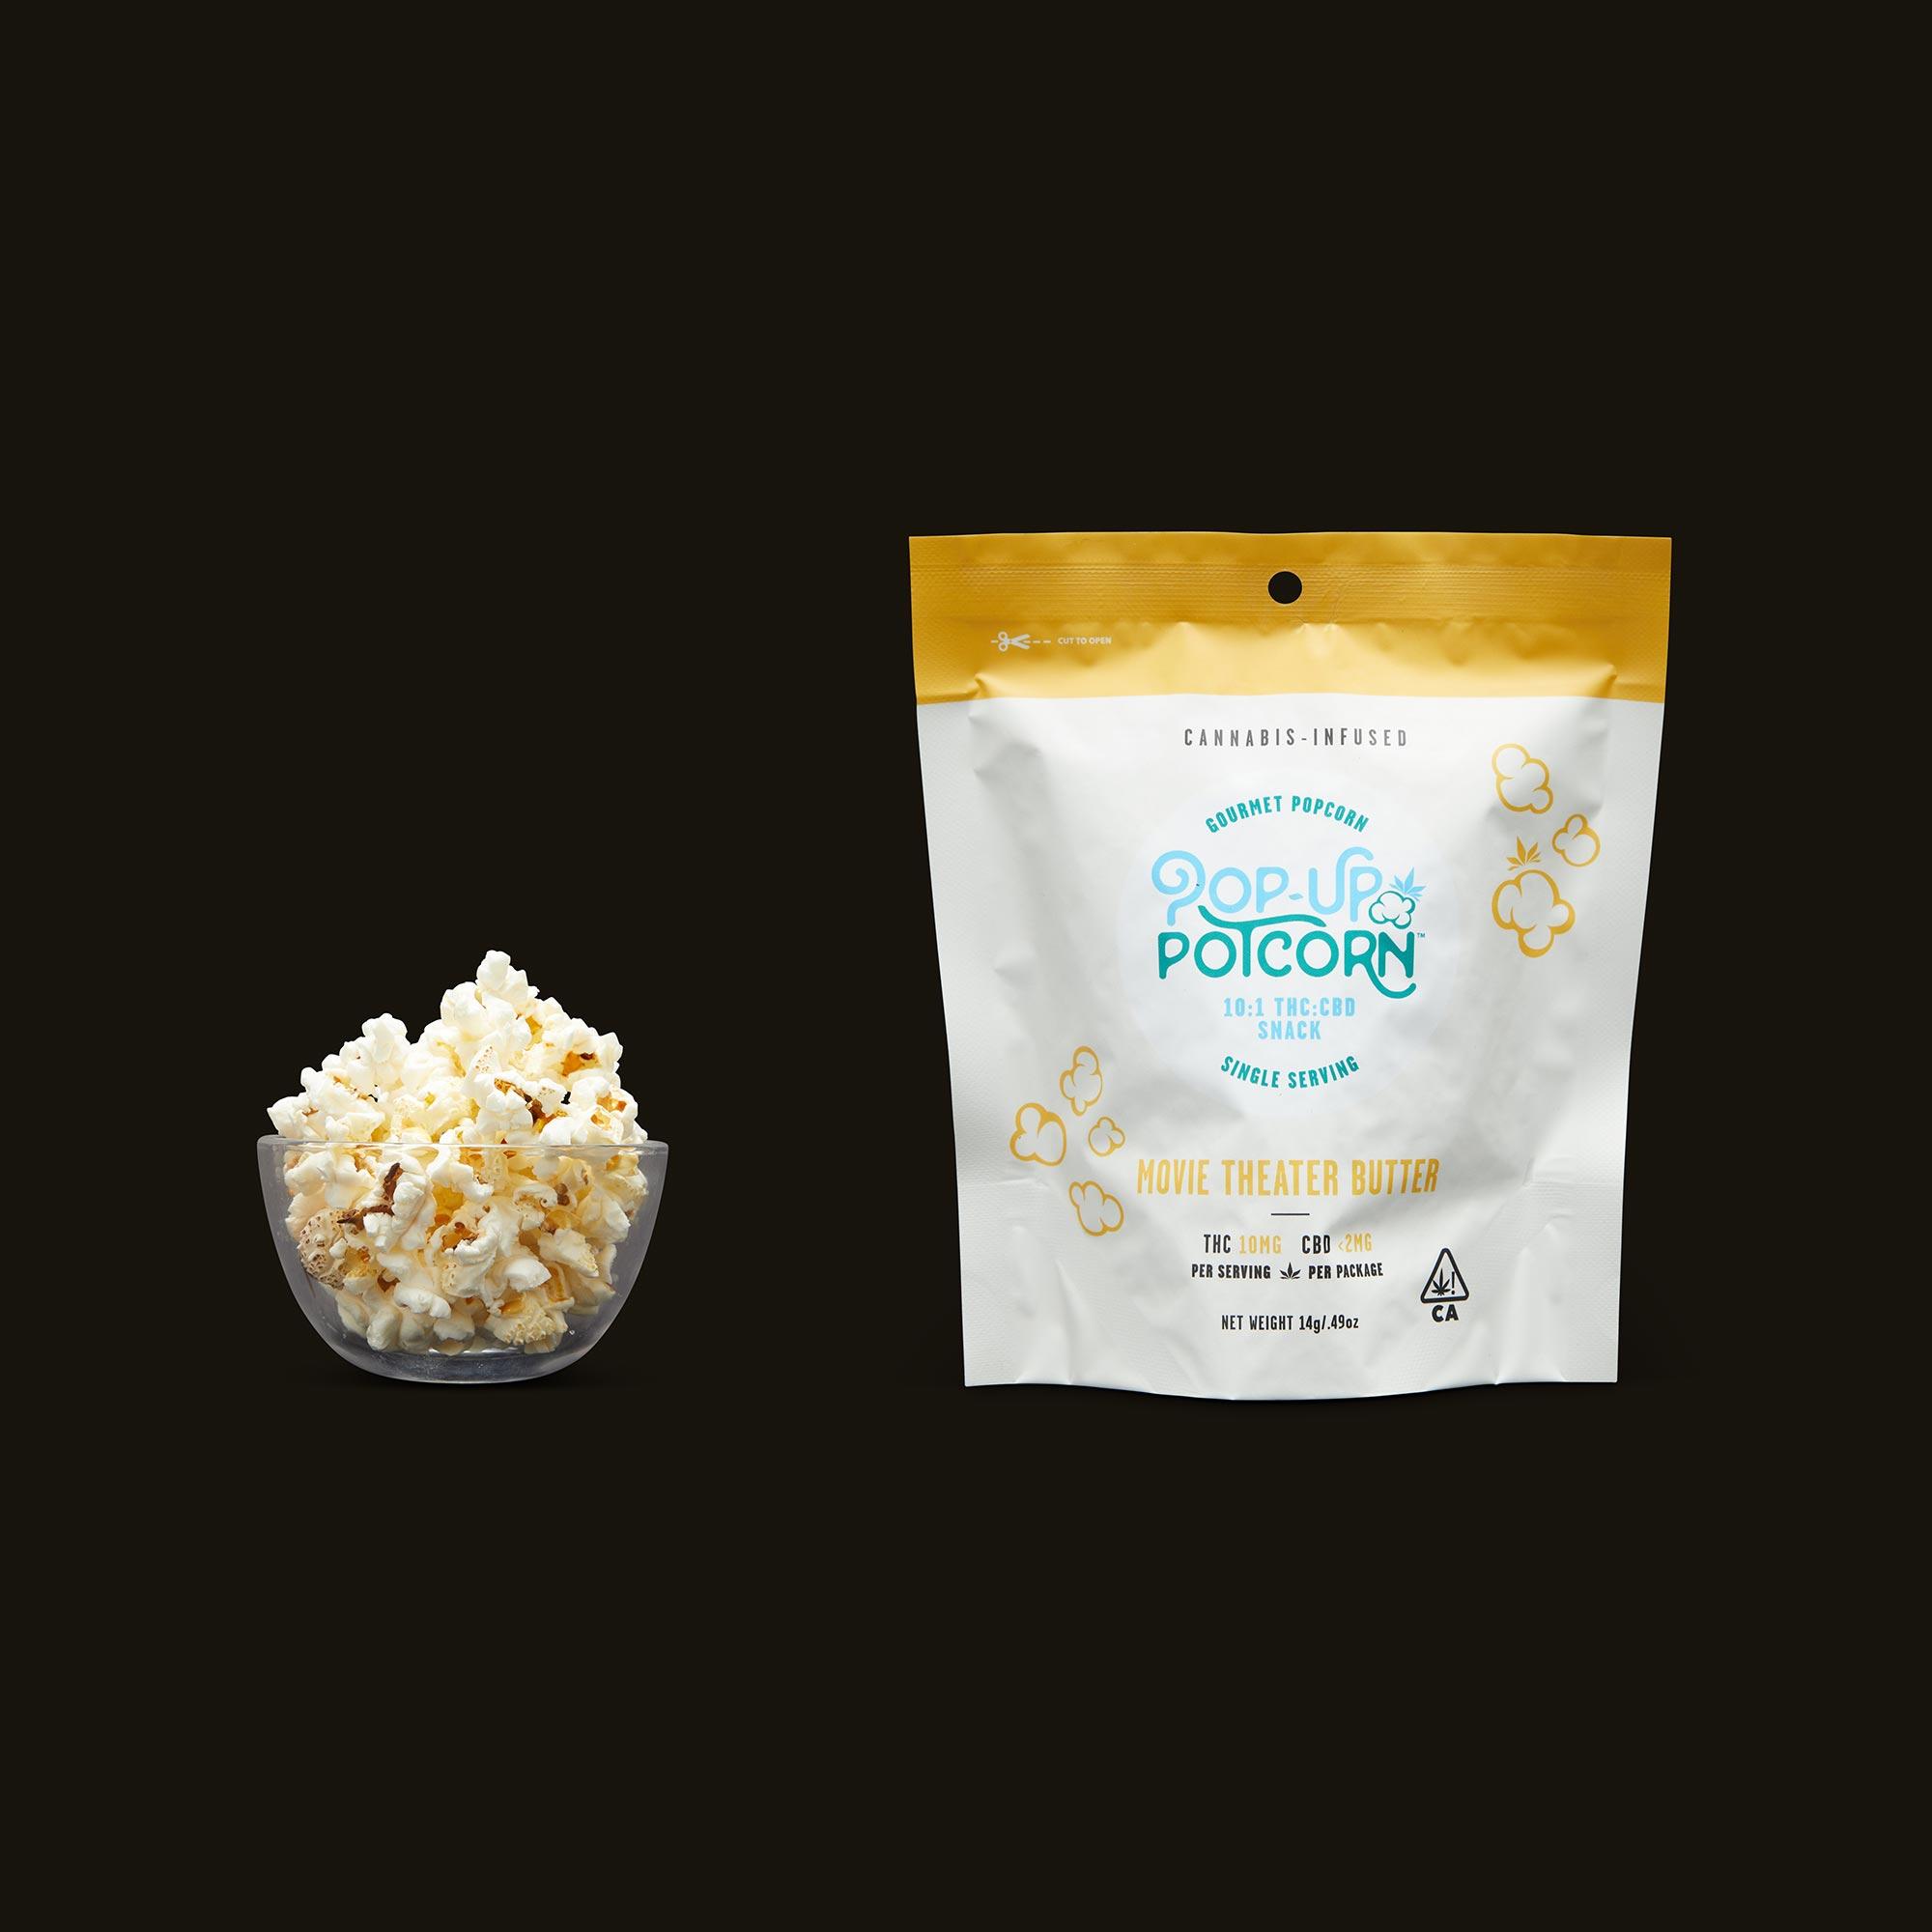 Pop-Up Potcorn Movie Theater Butter Popcorn 10:1 - Single